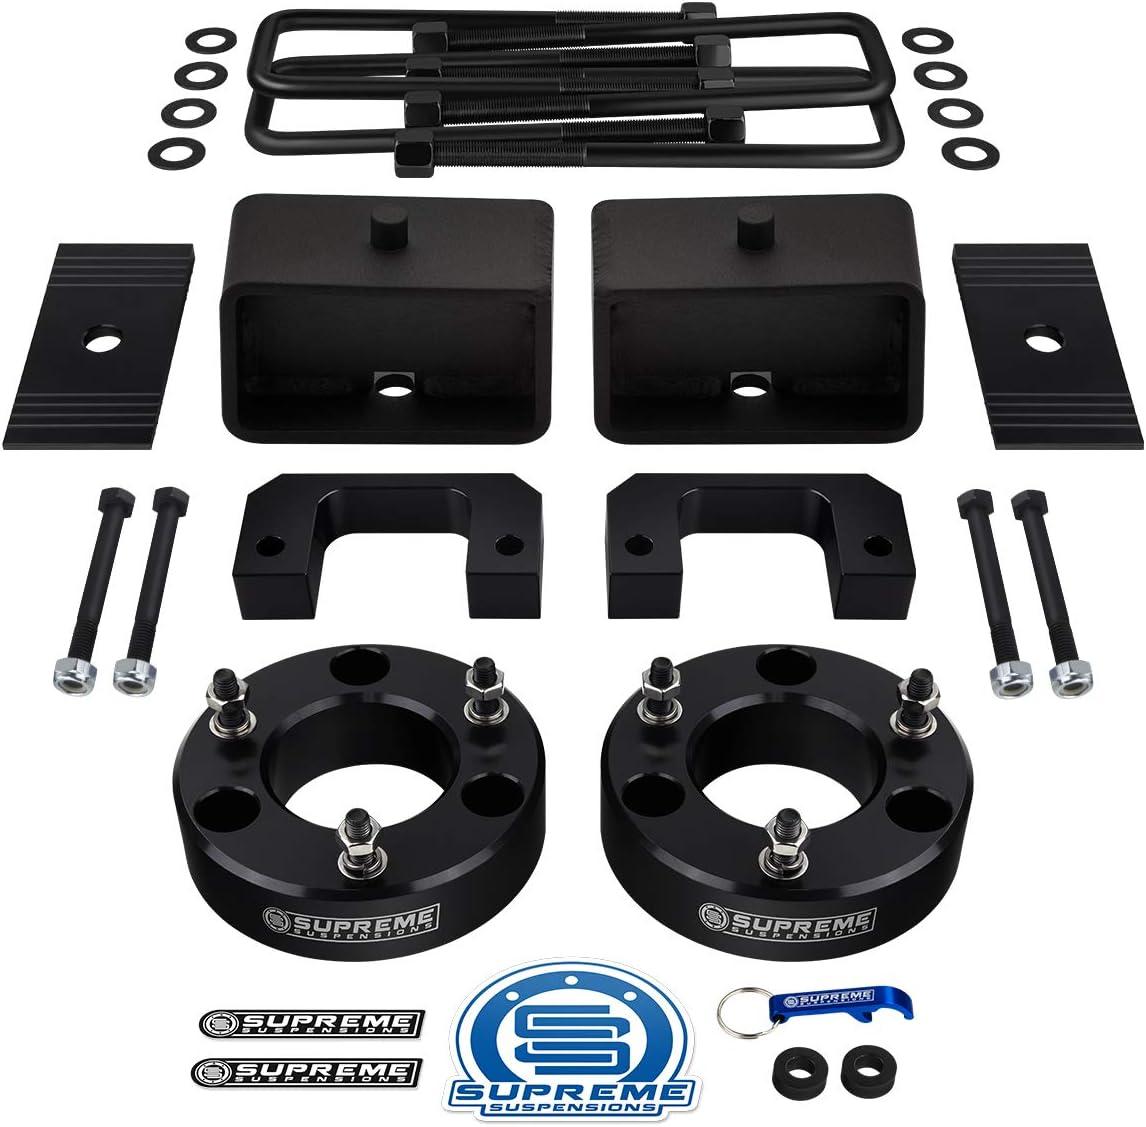 "Supreme Suspensions - Full Lift Kit for 2007-2020 Silverado Sierra 1500 3.5"" Front Lift Strut Spacers + 3"" Rear Lift Blocks + Square Bend U-Bolts + Axle Alignment Shims (Black)"